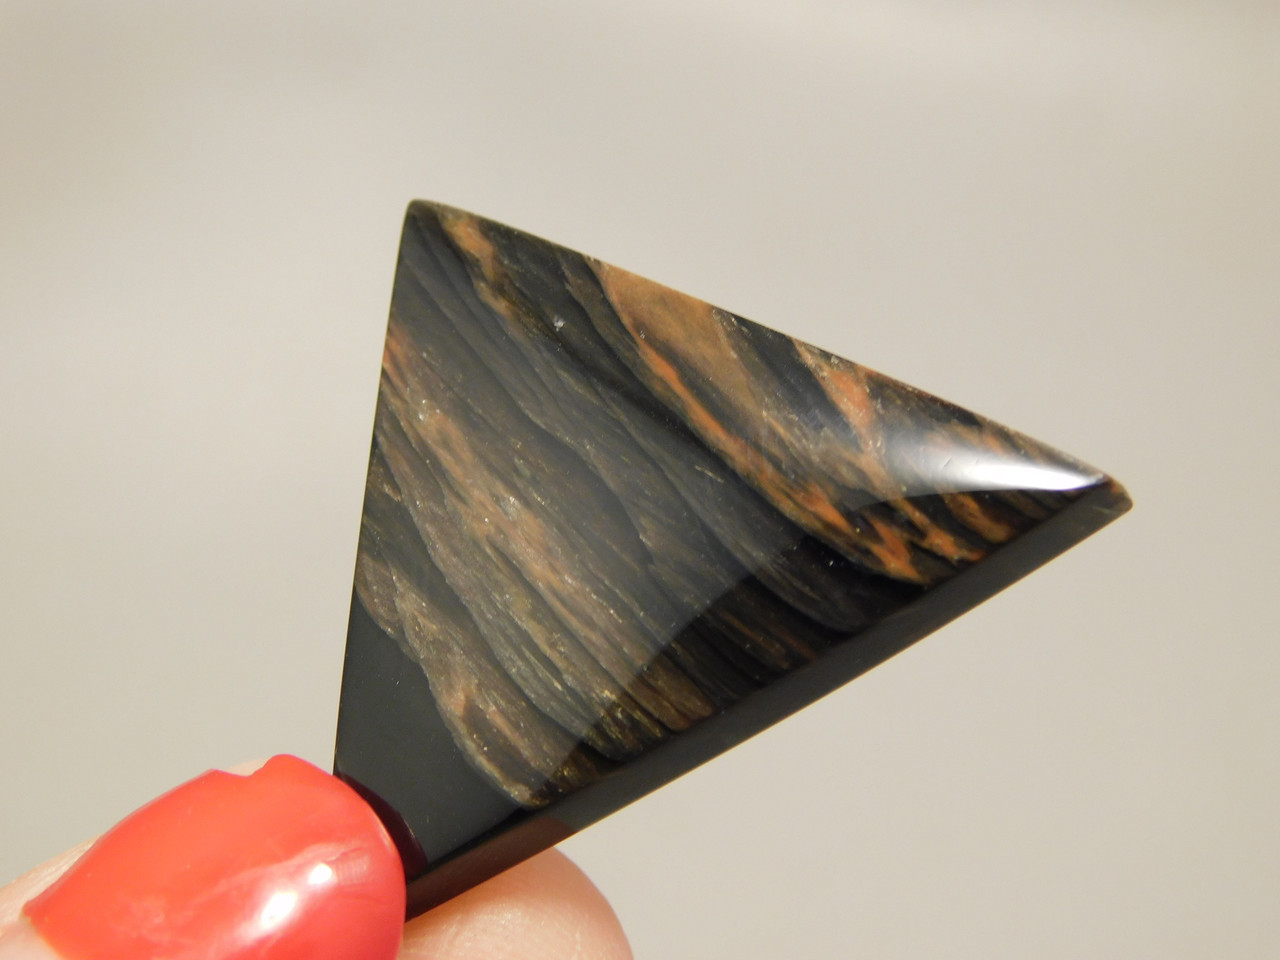 Mahogany Obsidian Designer Cabochon Semiprecious Gemstone #13